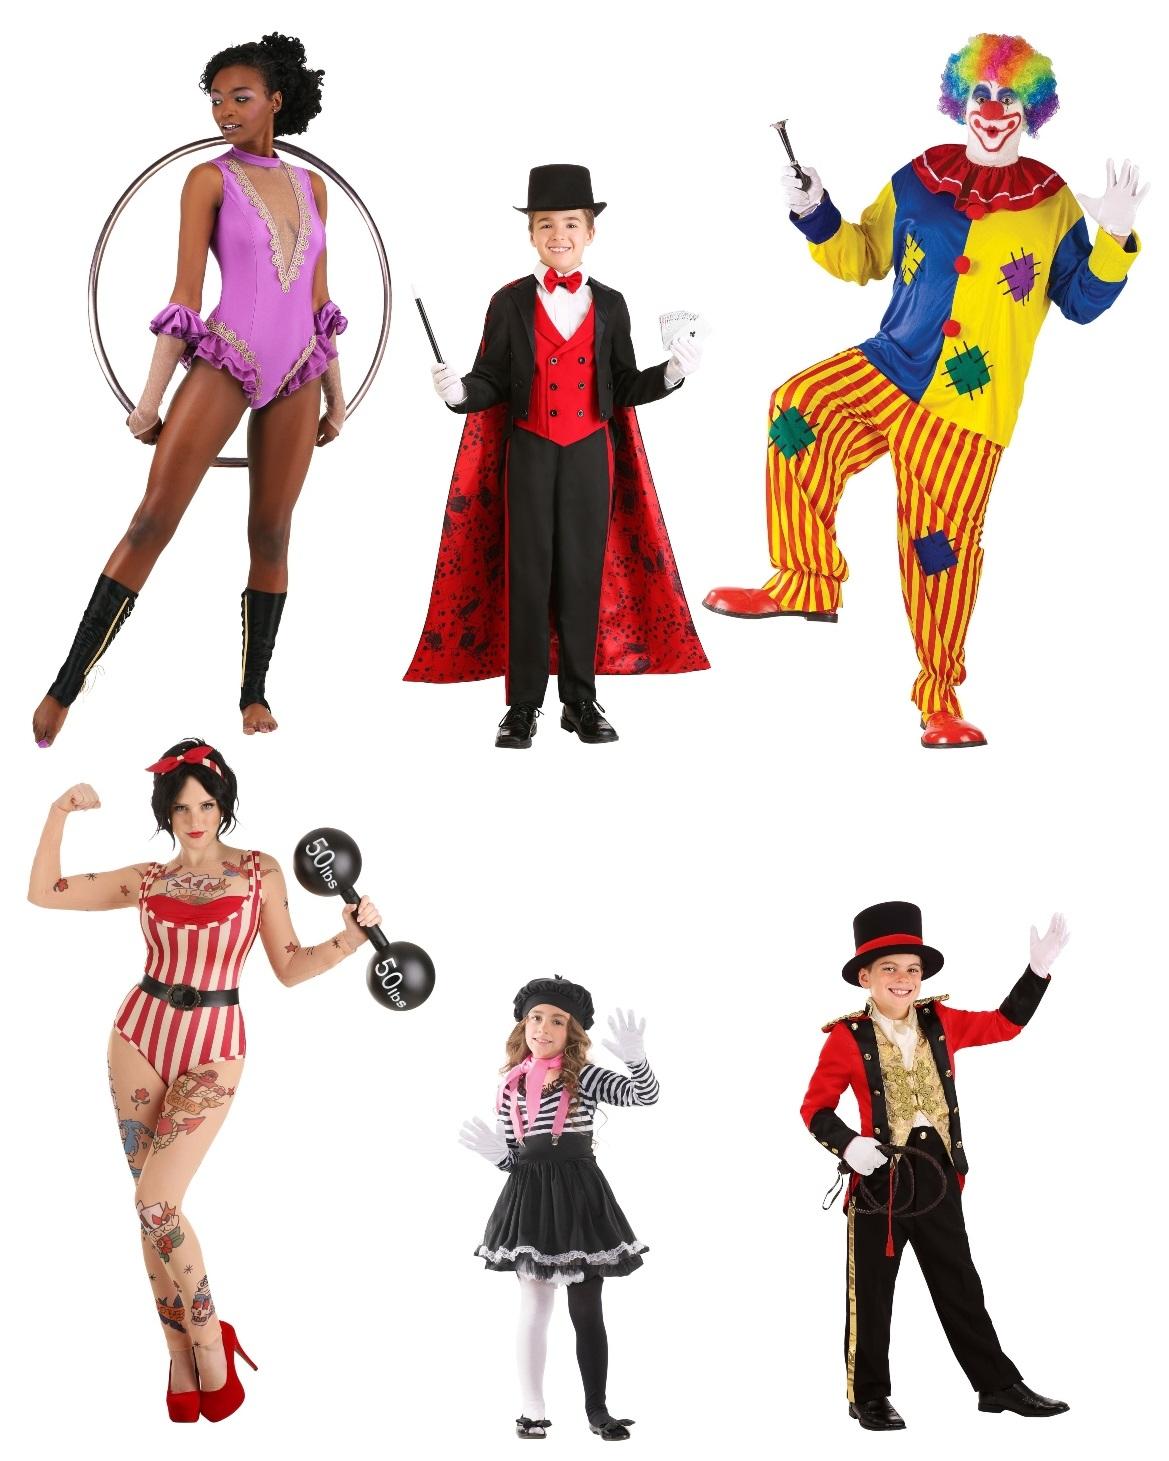 Circus Group Costume Ideas